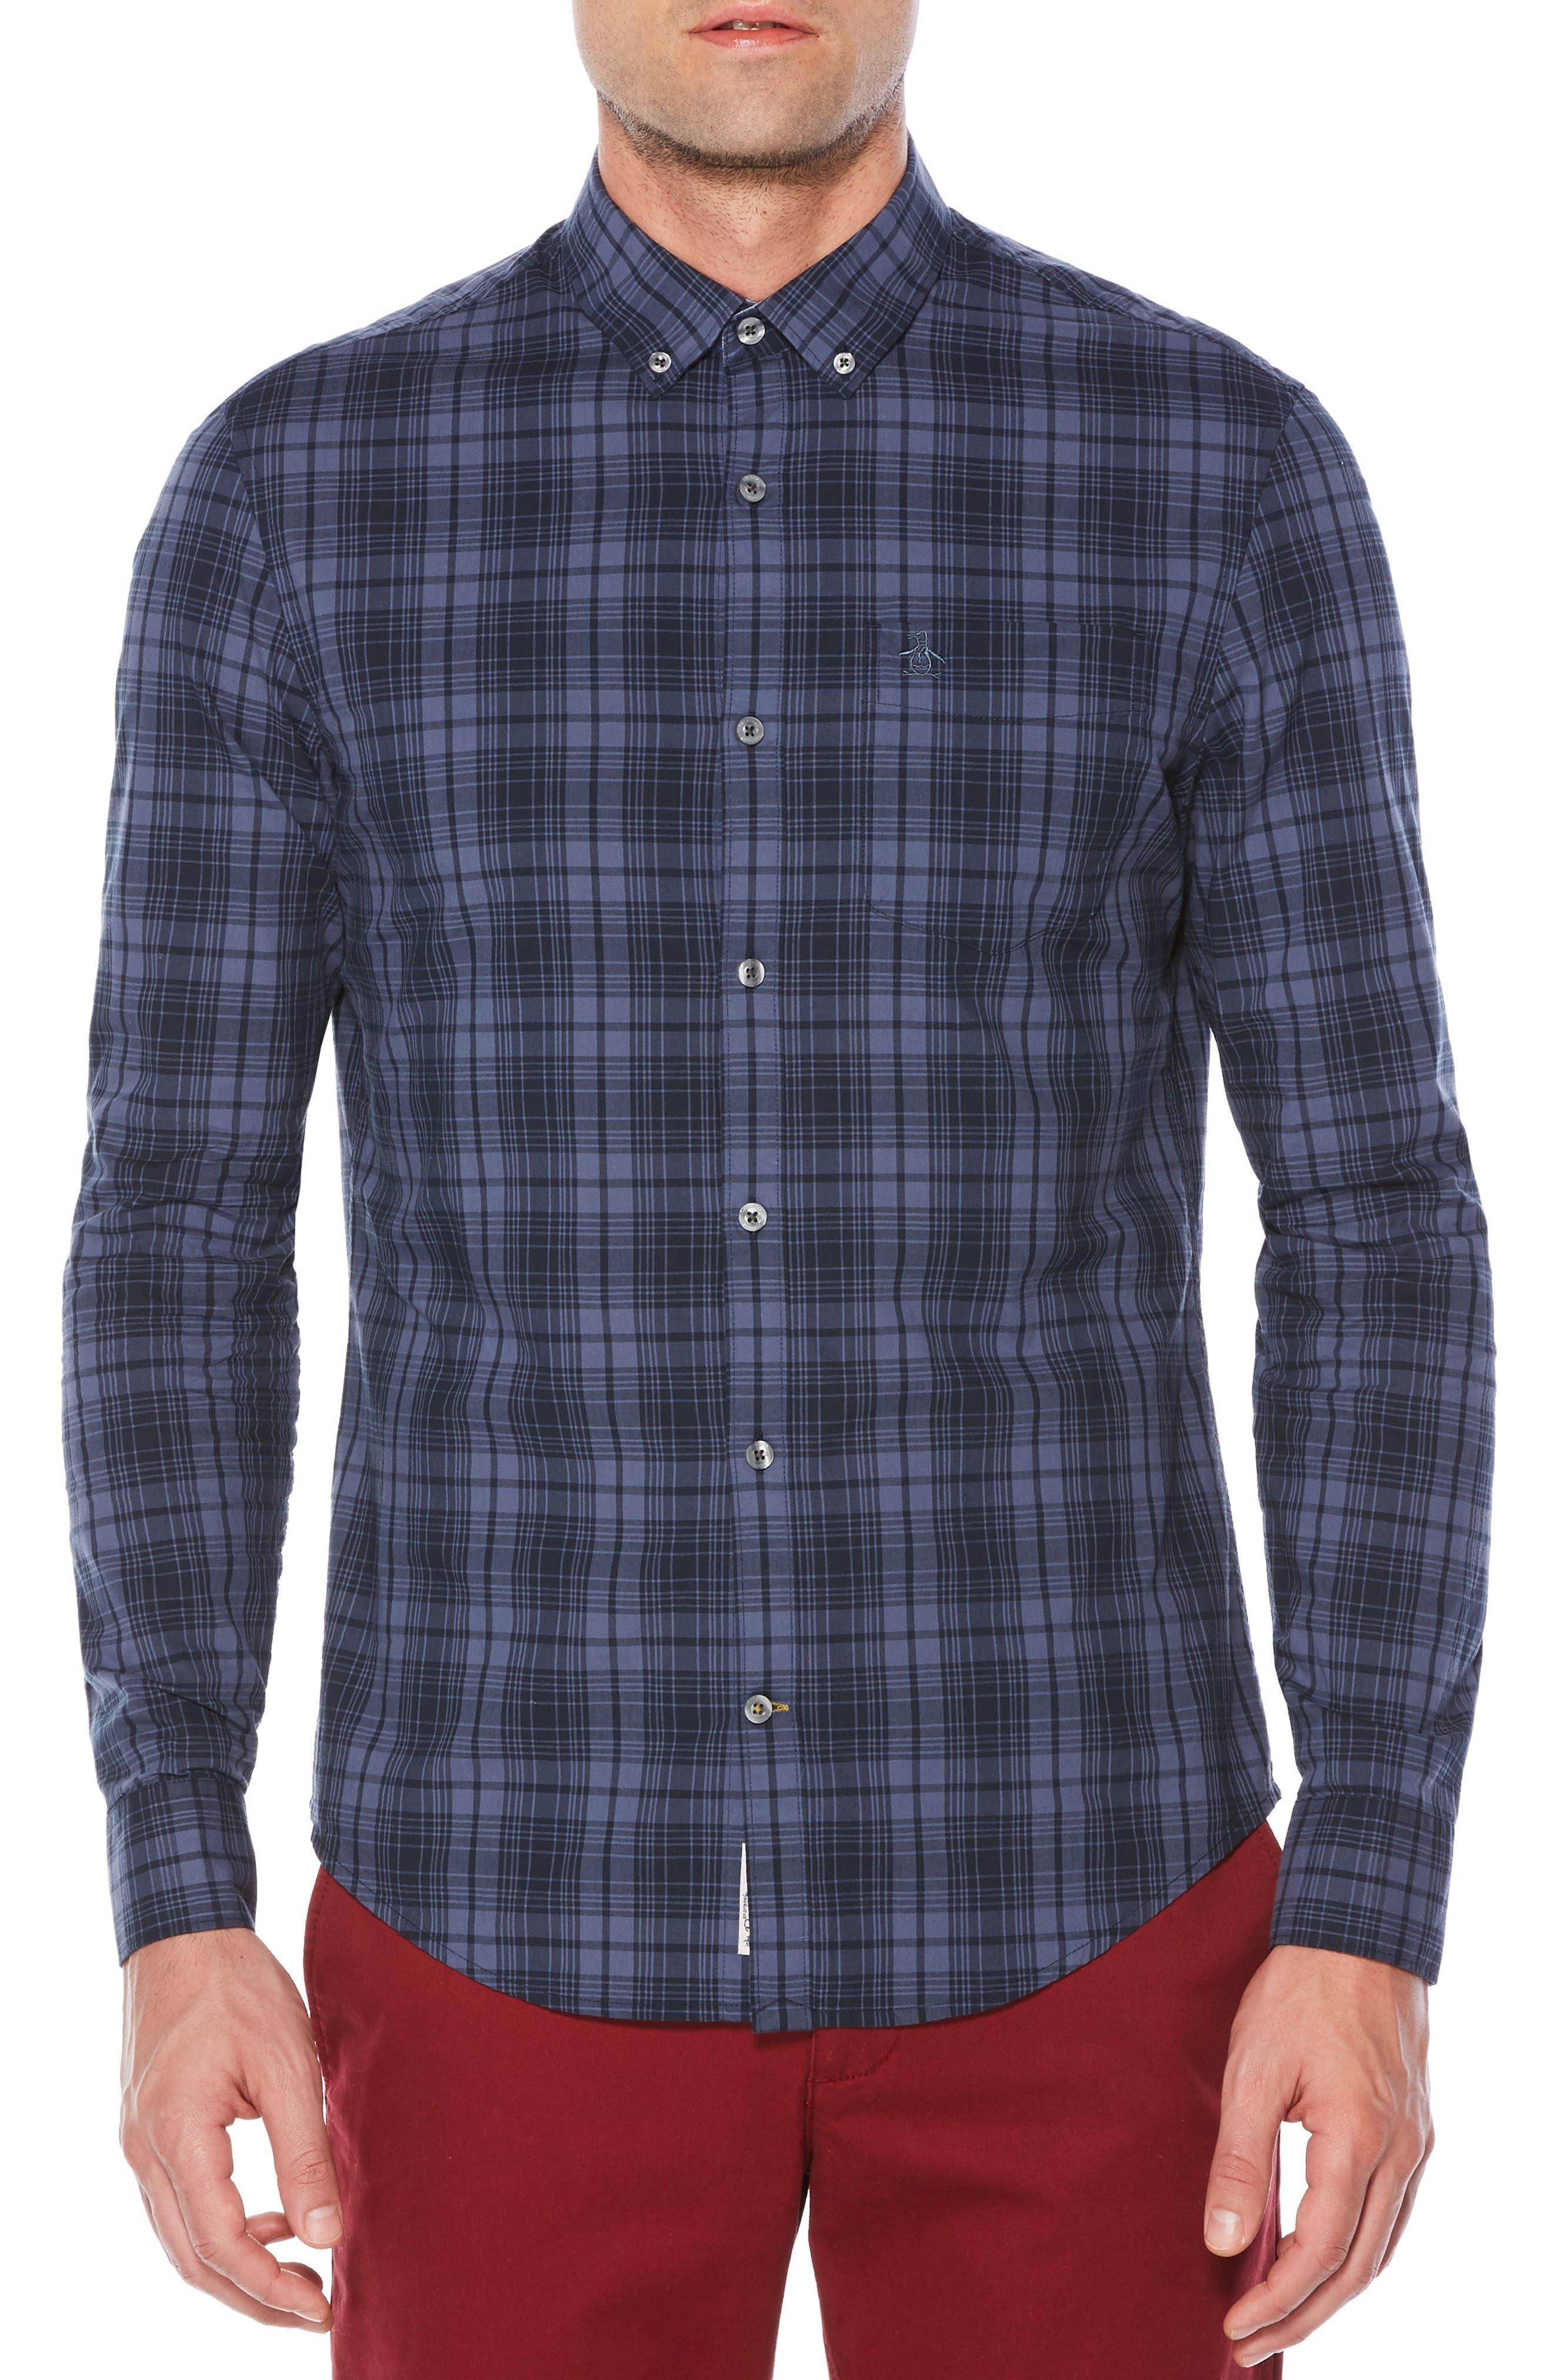 Main Image - Original Penguin Heritage Slim Fit Plaid Shirt